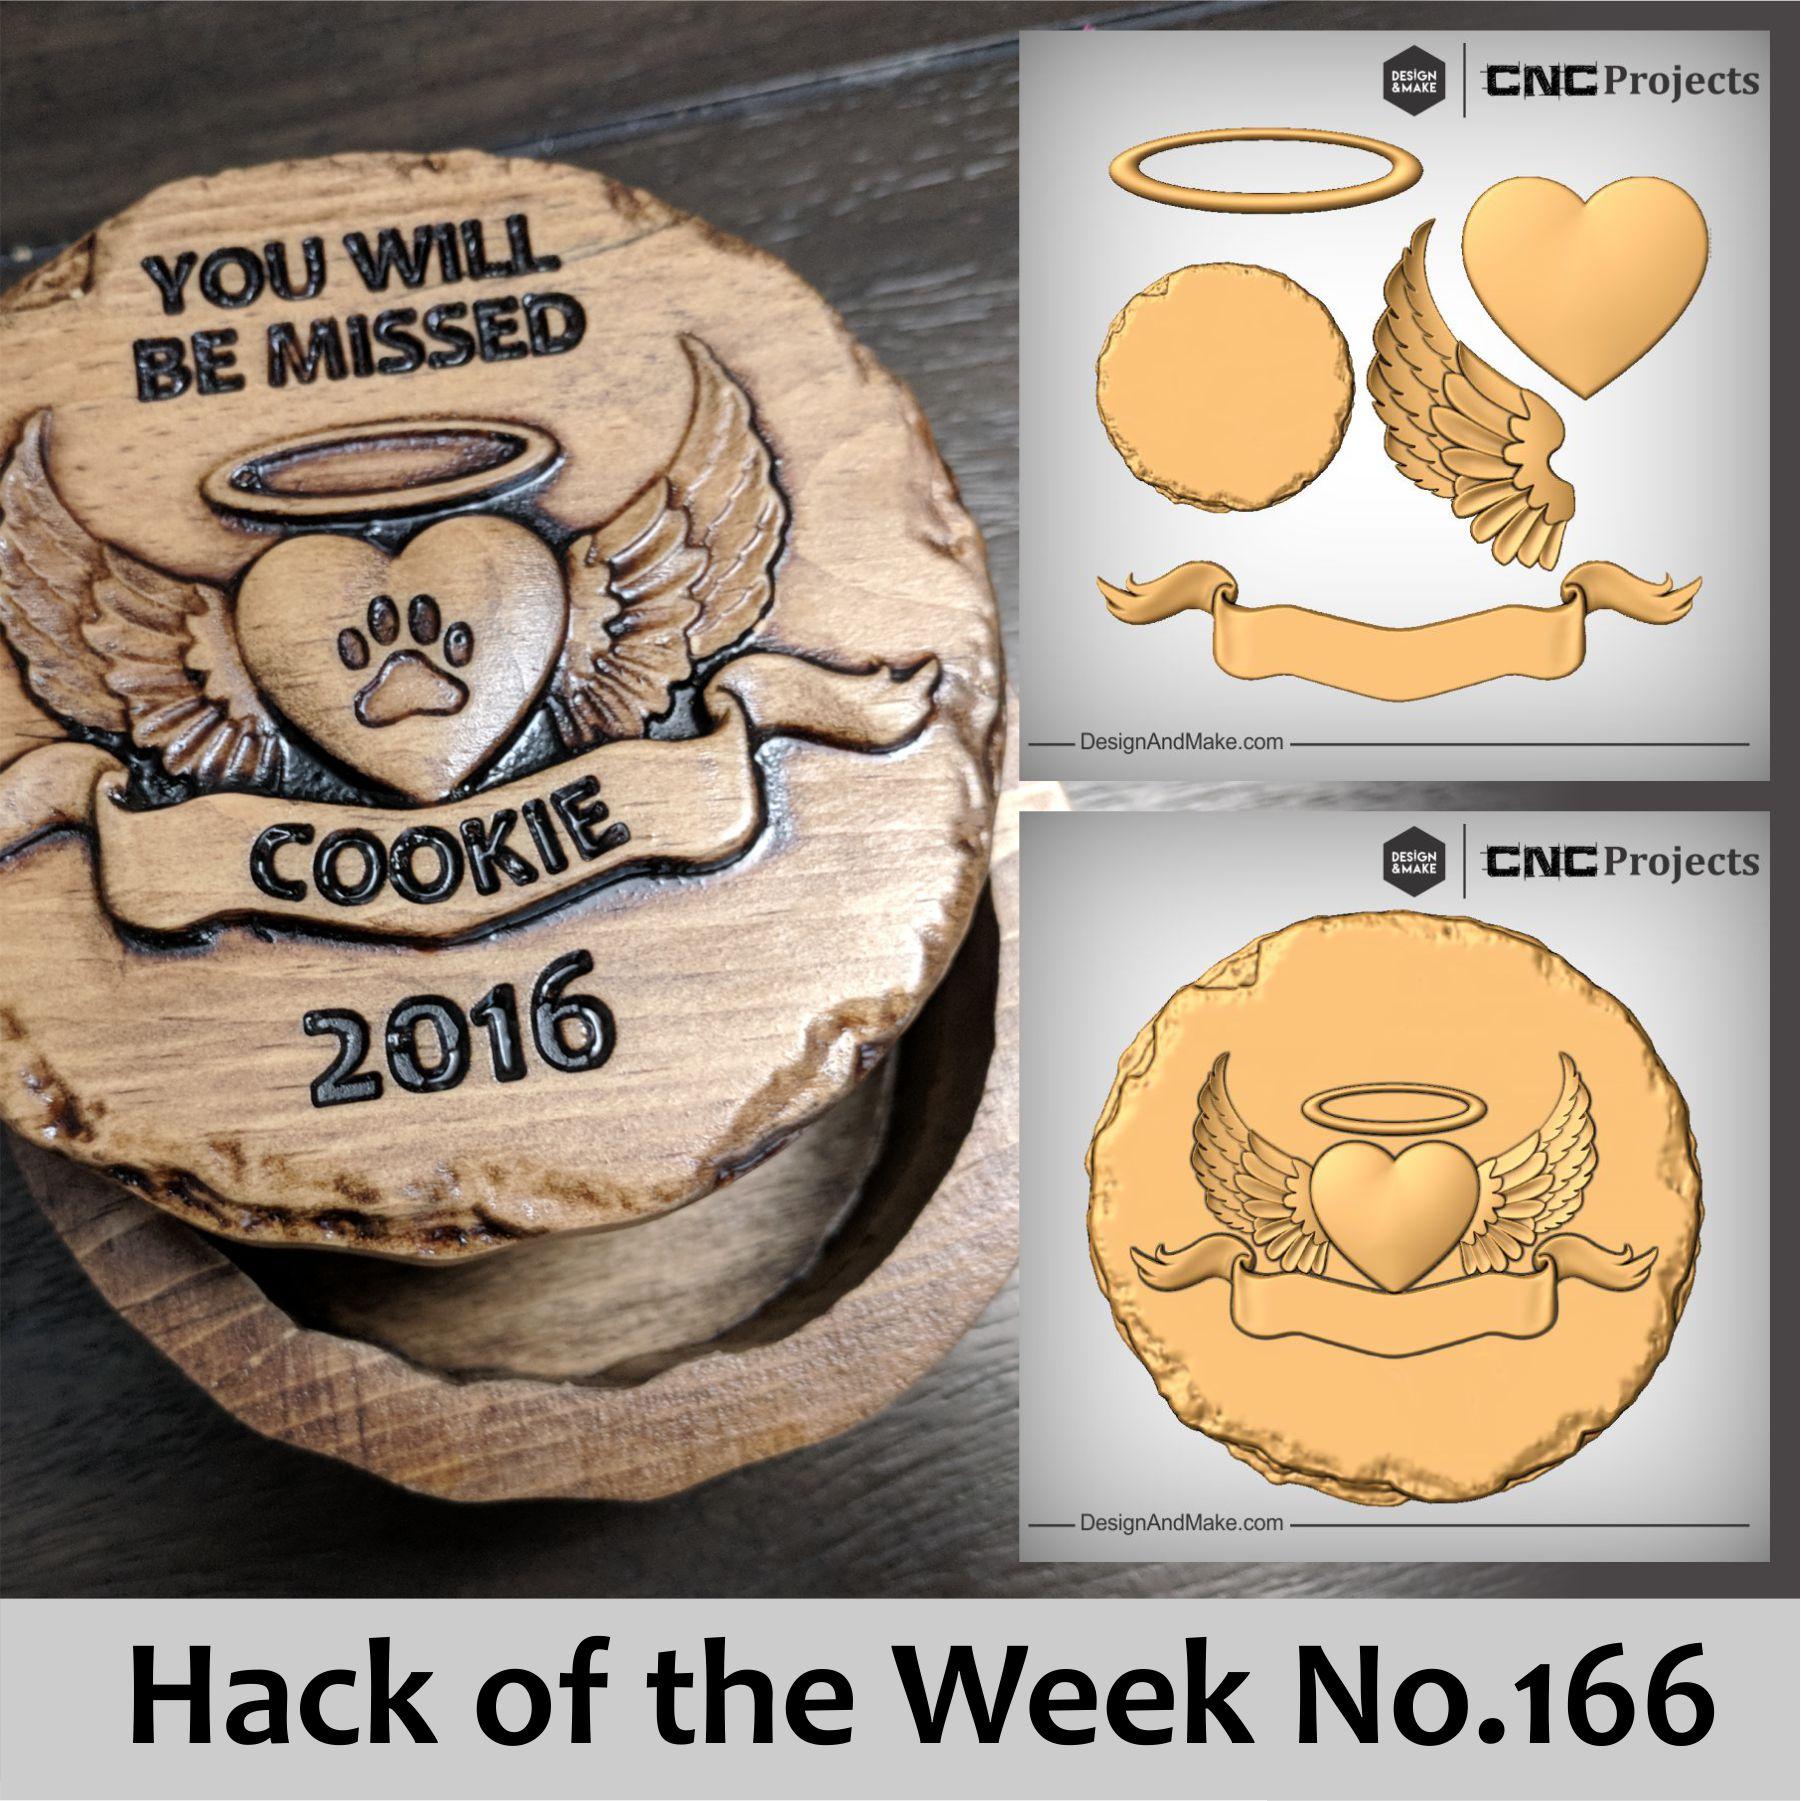 Hack of the Week No.166 Challange